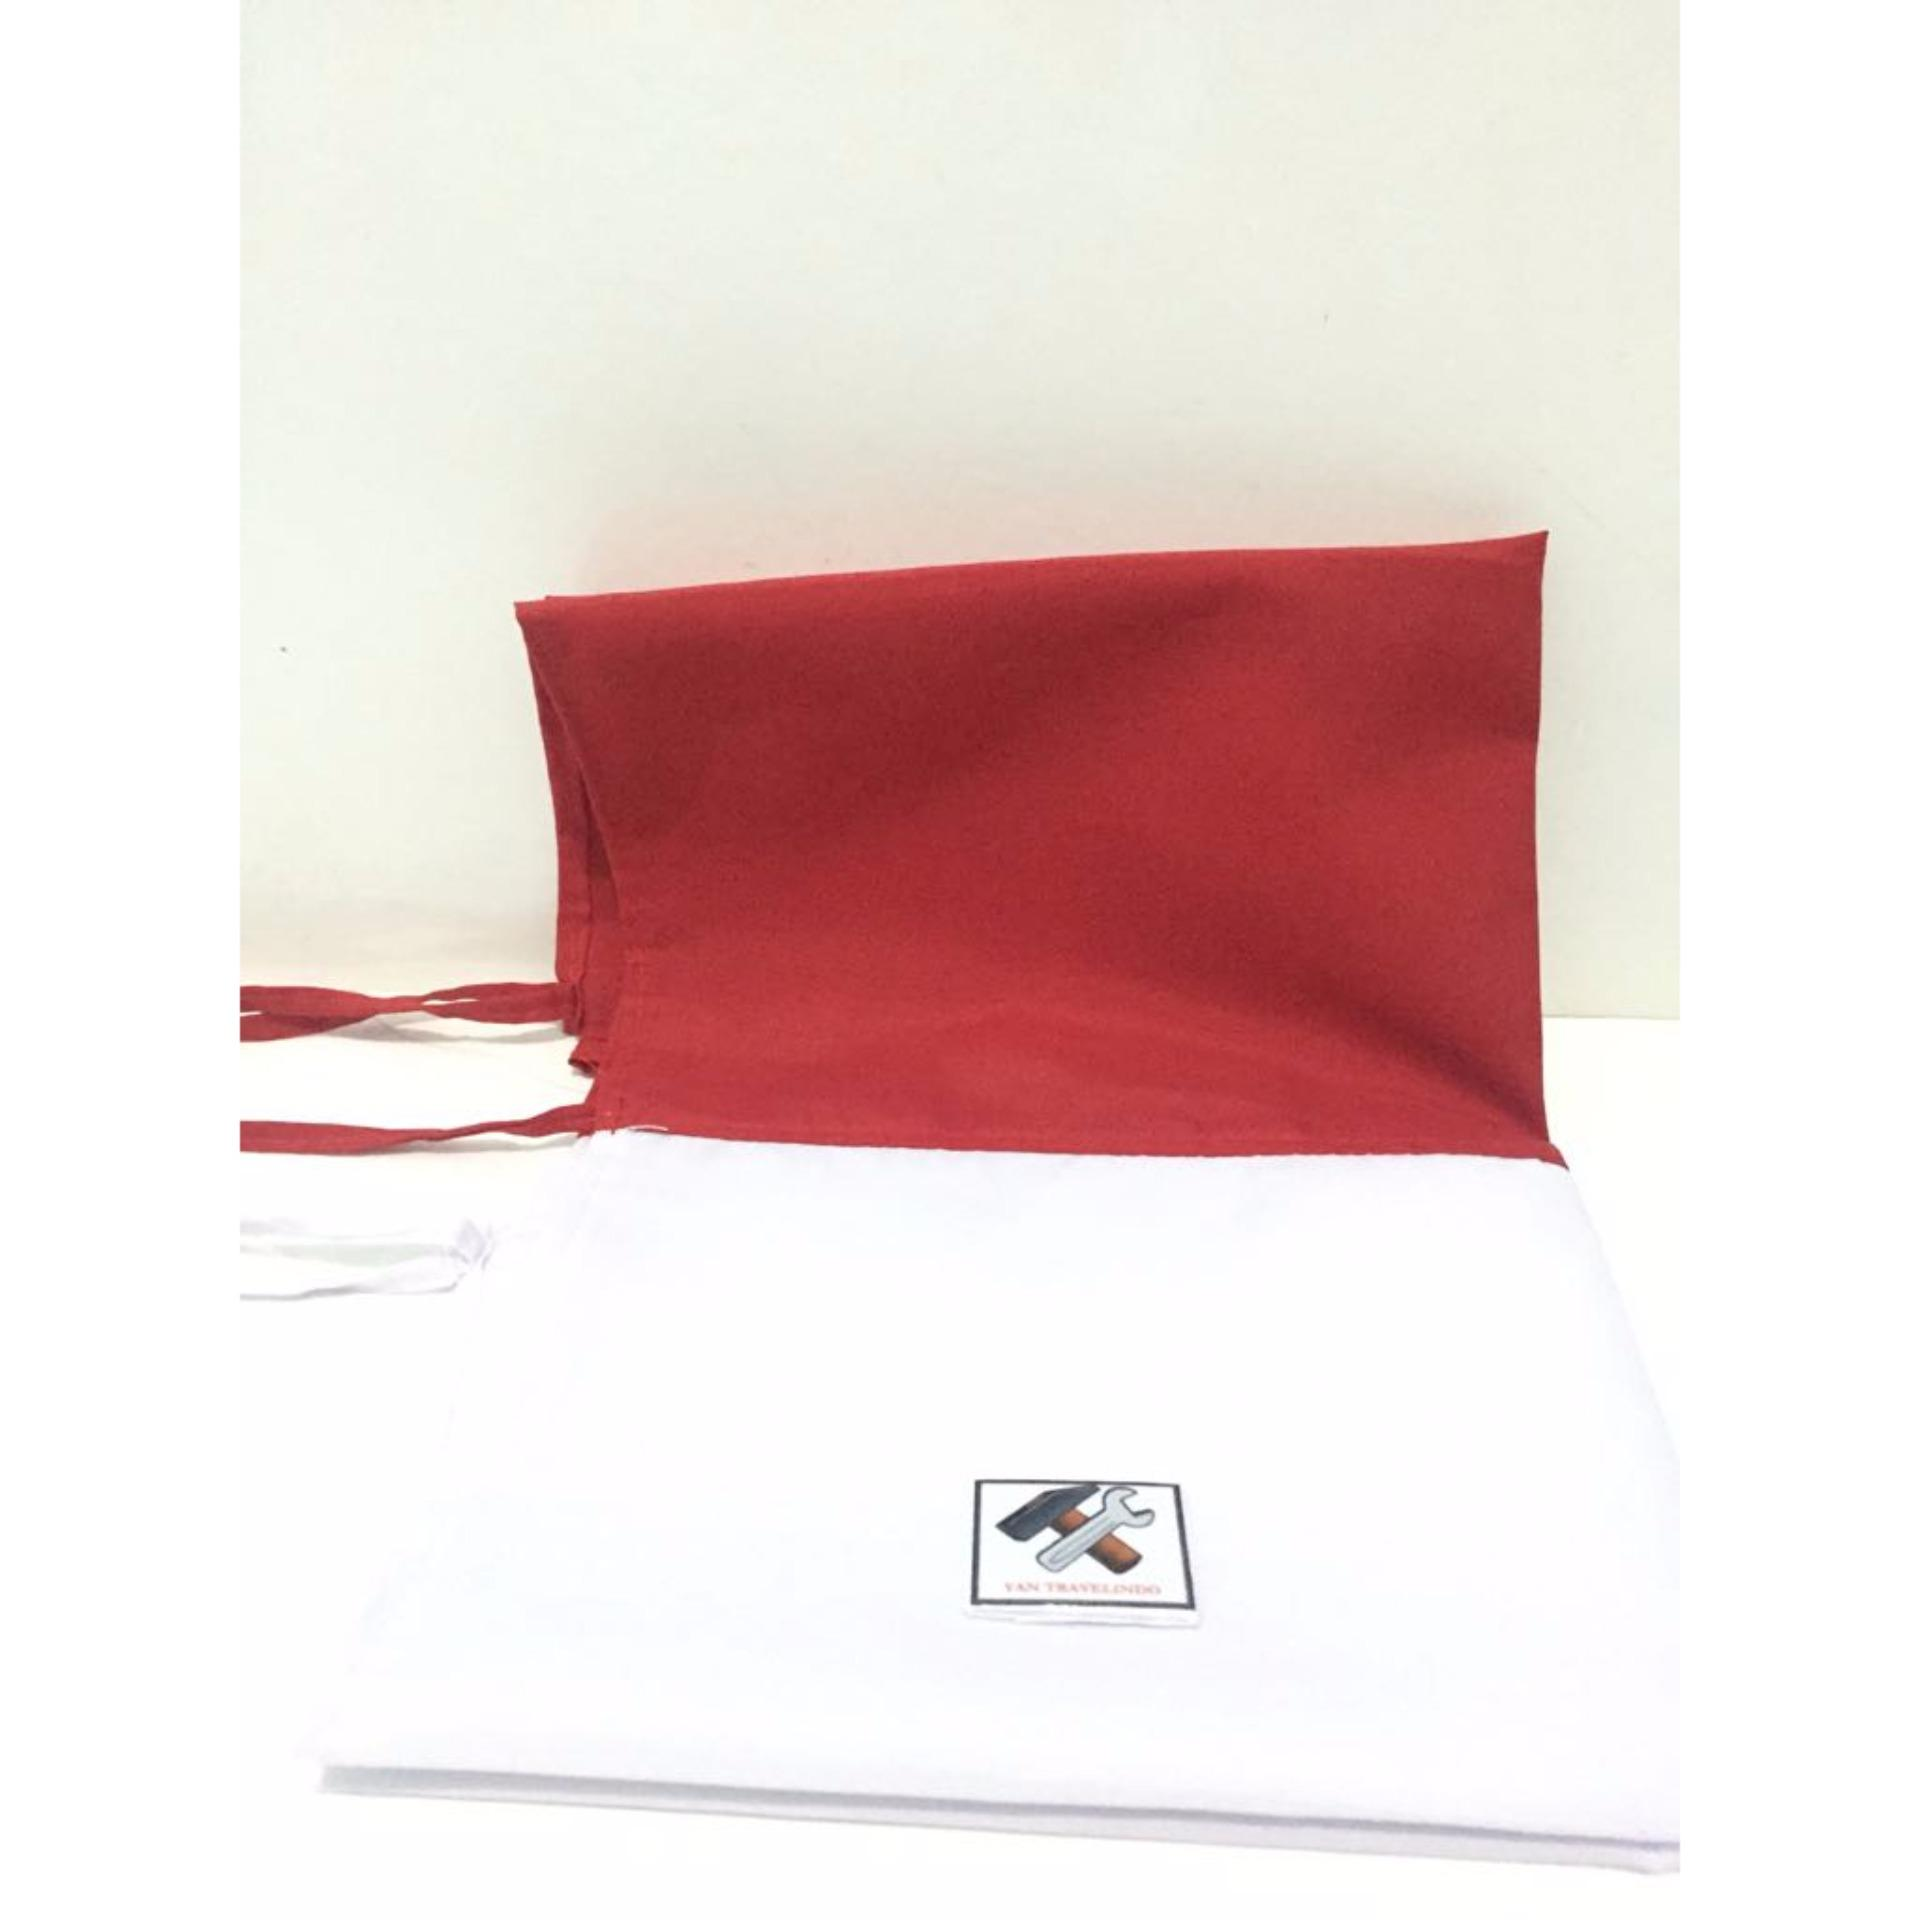 Fitur Harga Spesial Stiker Cromo Glossy Bendera Merah Putih Plastik Flag Palstik 17 Agustusan Murah Berkualitas Jahitan Halus Kain